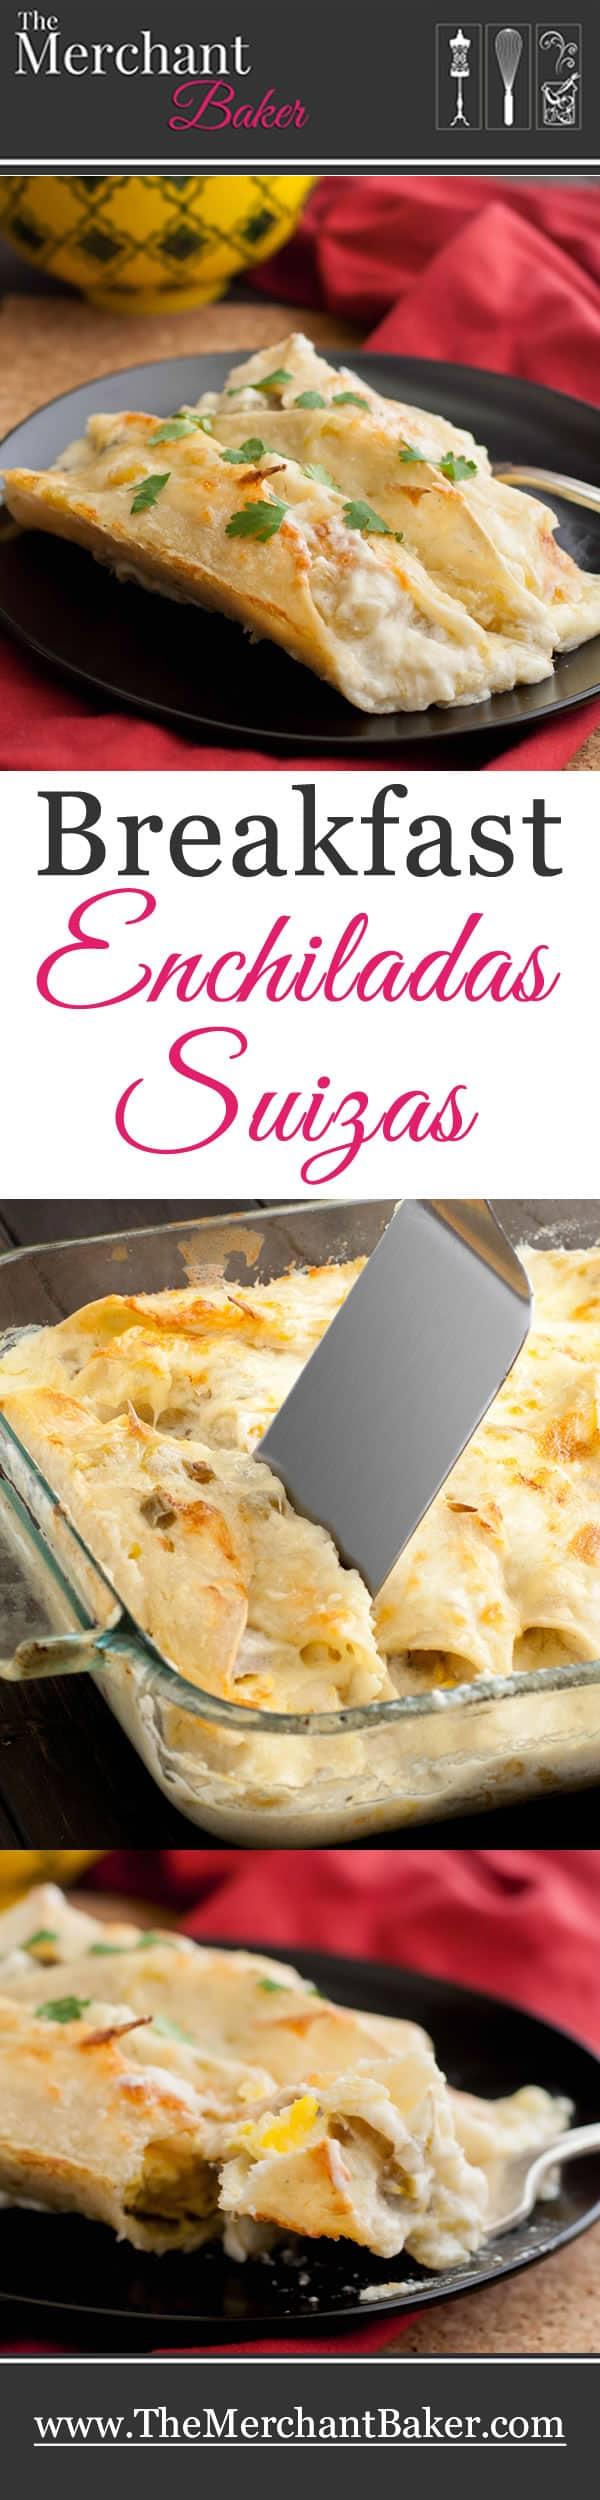 Breakfast Enchiladas Suizas